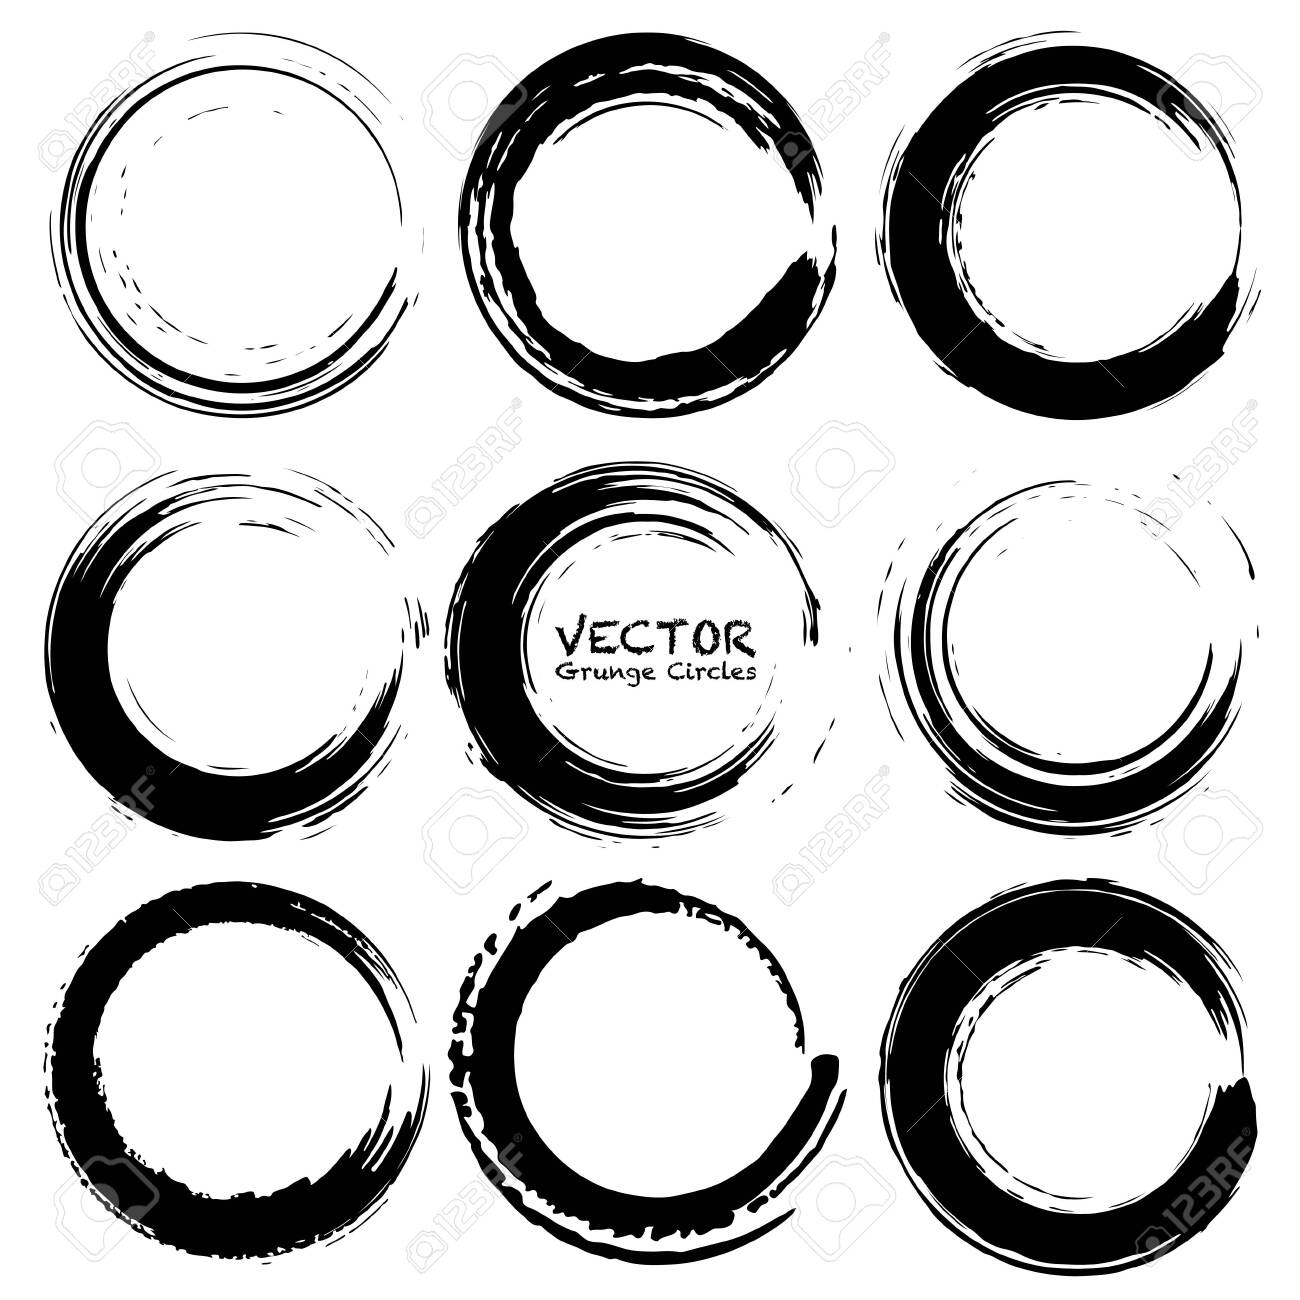 Set of grunge circles, Grunge round shapes, Vector illustration. - 123853763